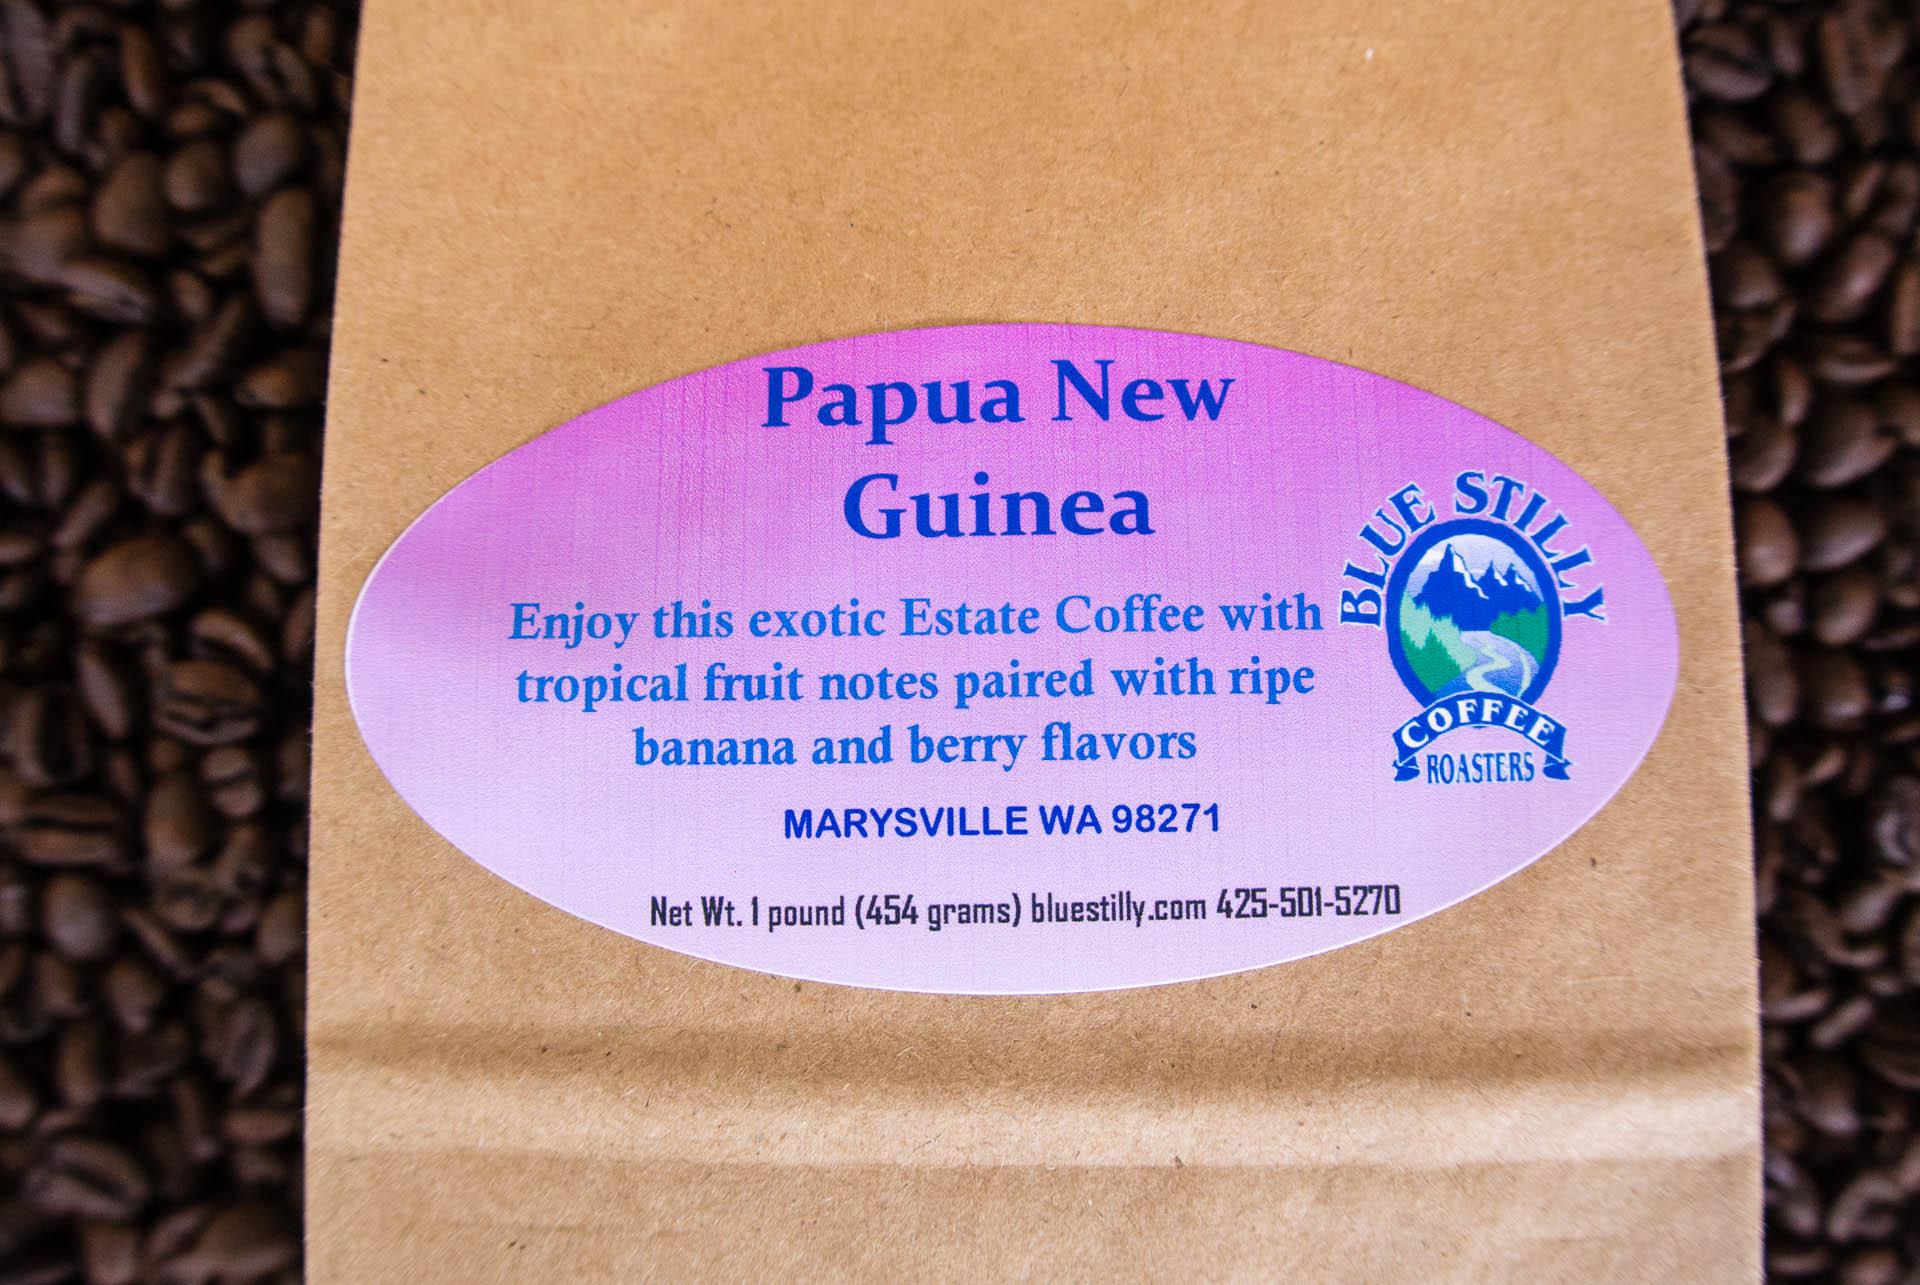 Paupa New Guinea